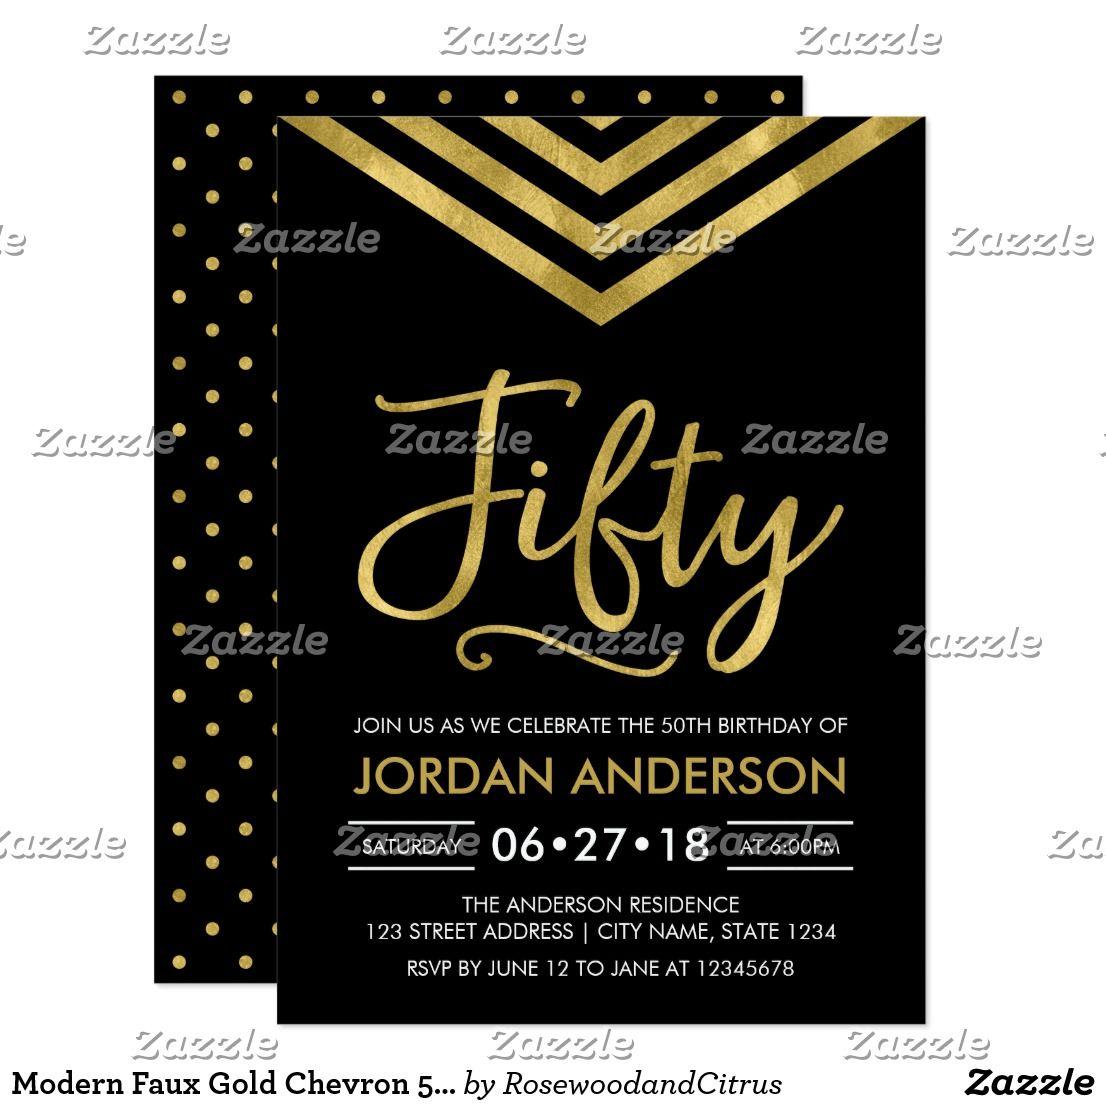 Modern Faux Gold Chevron 50th Birthday Party Invitation | Zazzle.com | 50th  birthday party invitations, 50th birthday, 50th birthday invitations